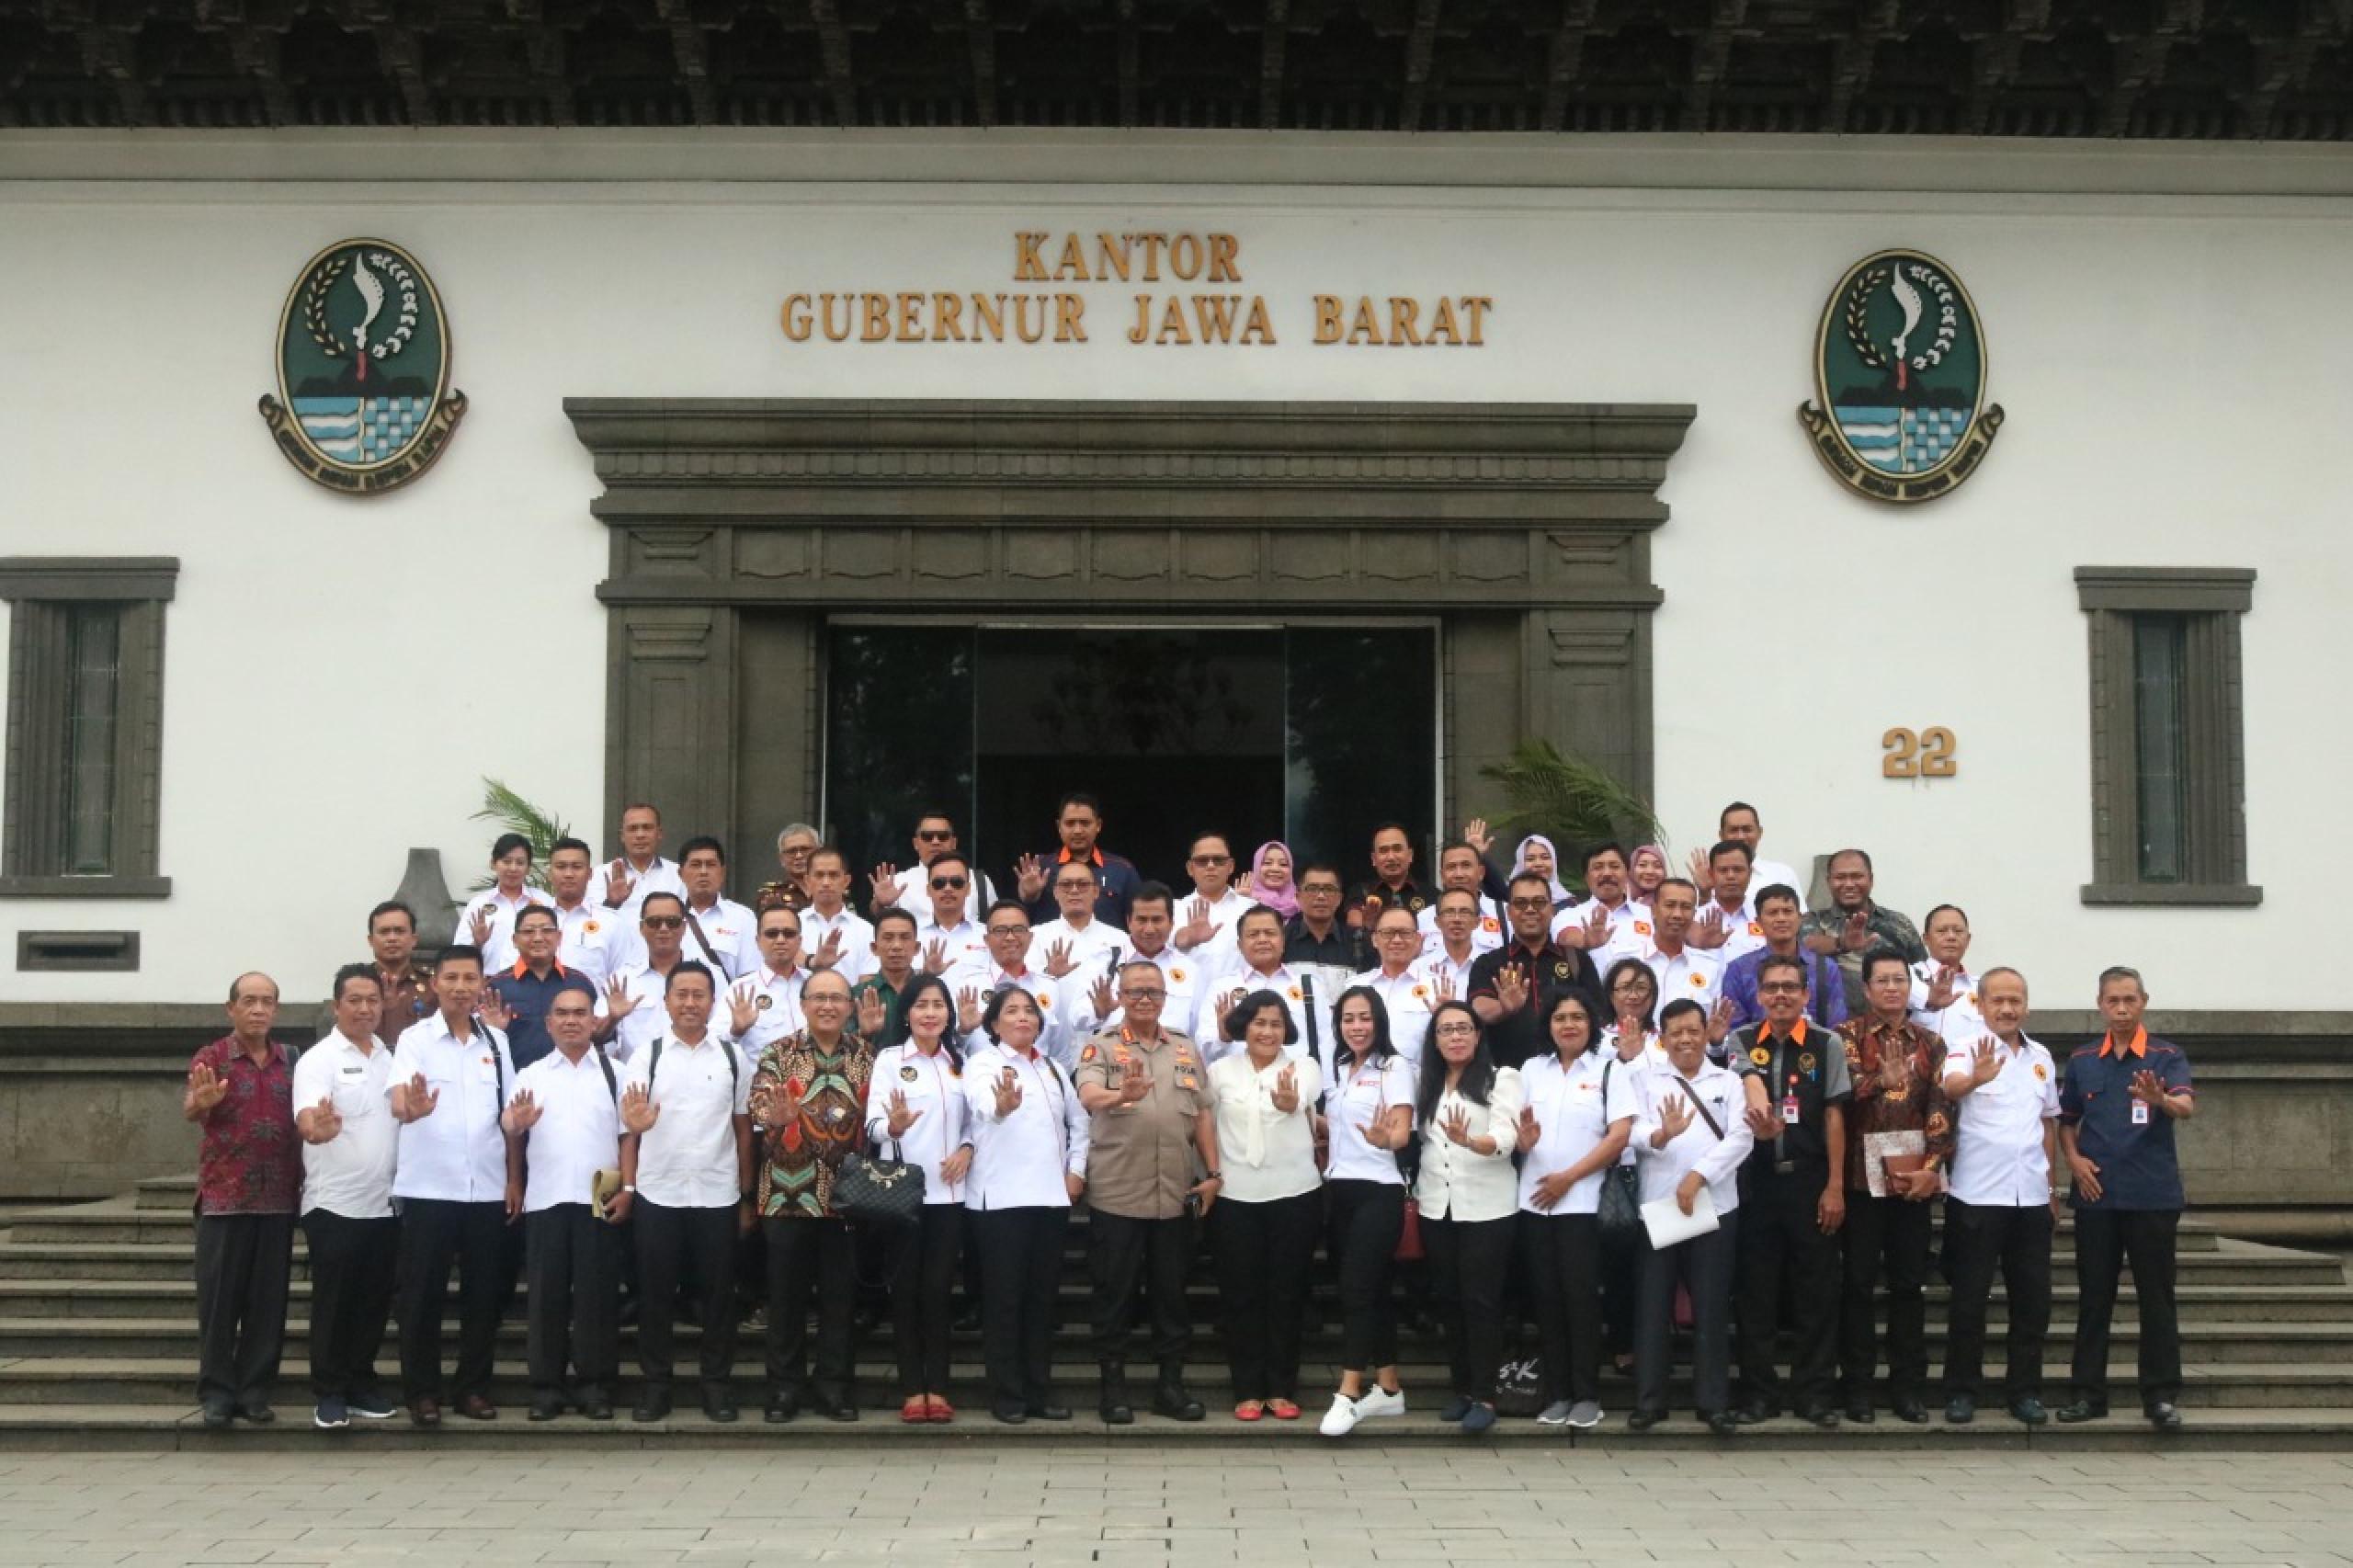 saberpungli jabar - Satgas Saberpungli Jabar Terima Kunjungan Kerja Dari UPP Prov Bali